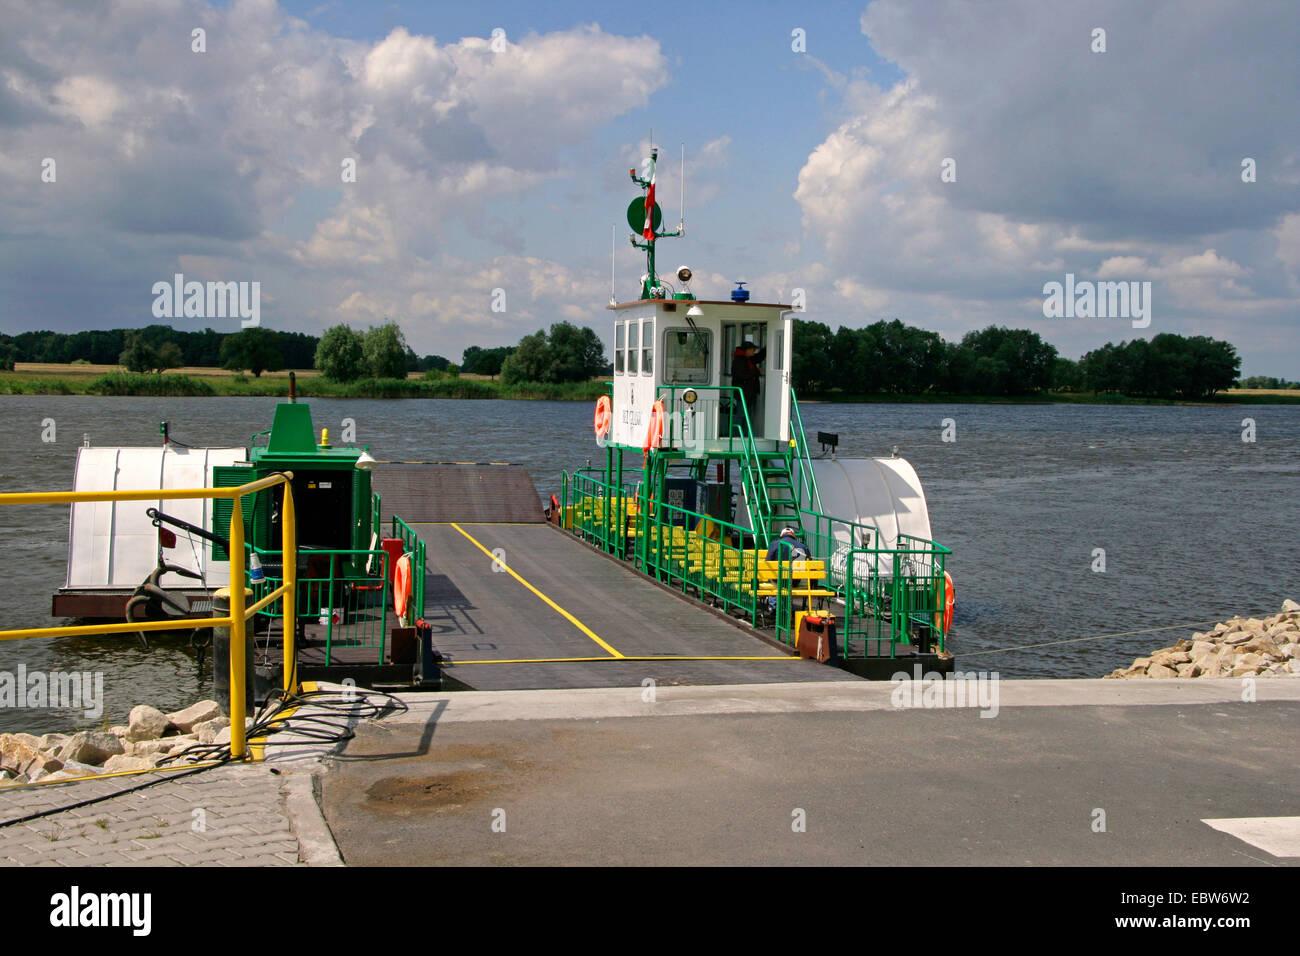 car ferry at riverbank of Elbe between Poland and Germany, Poland, West Pomeranian Voivodeship, Gozdowice Stock Photo